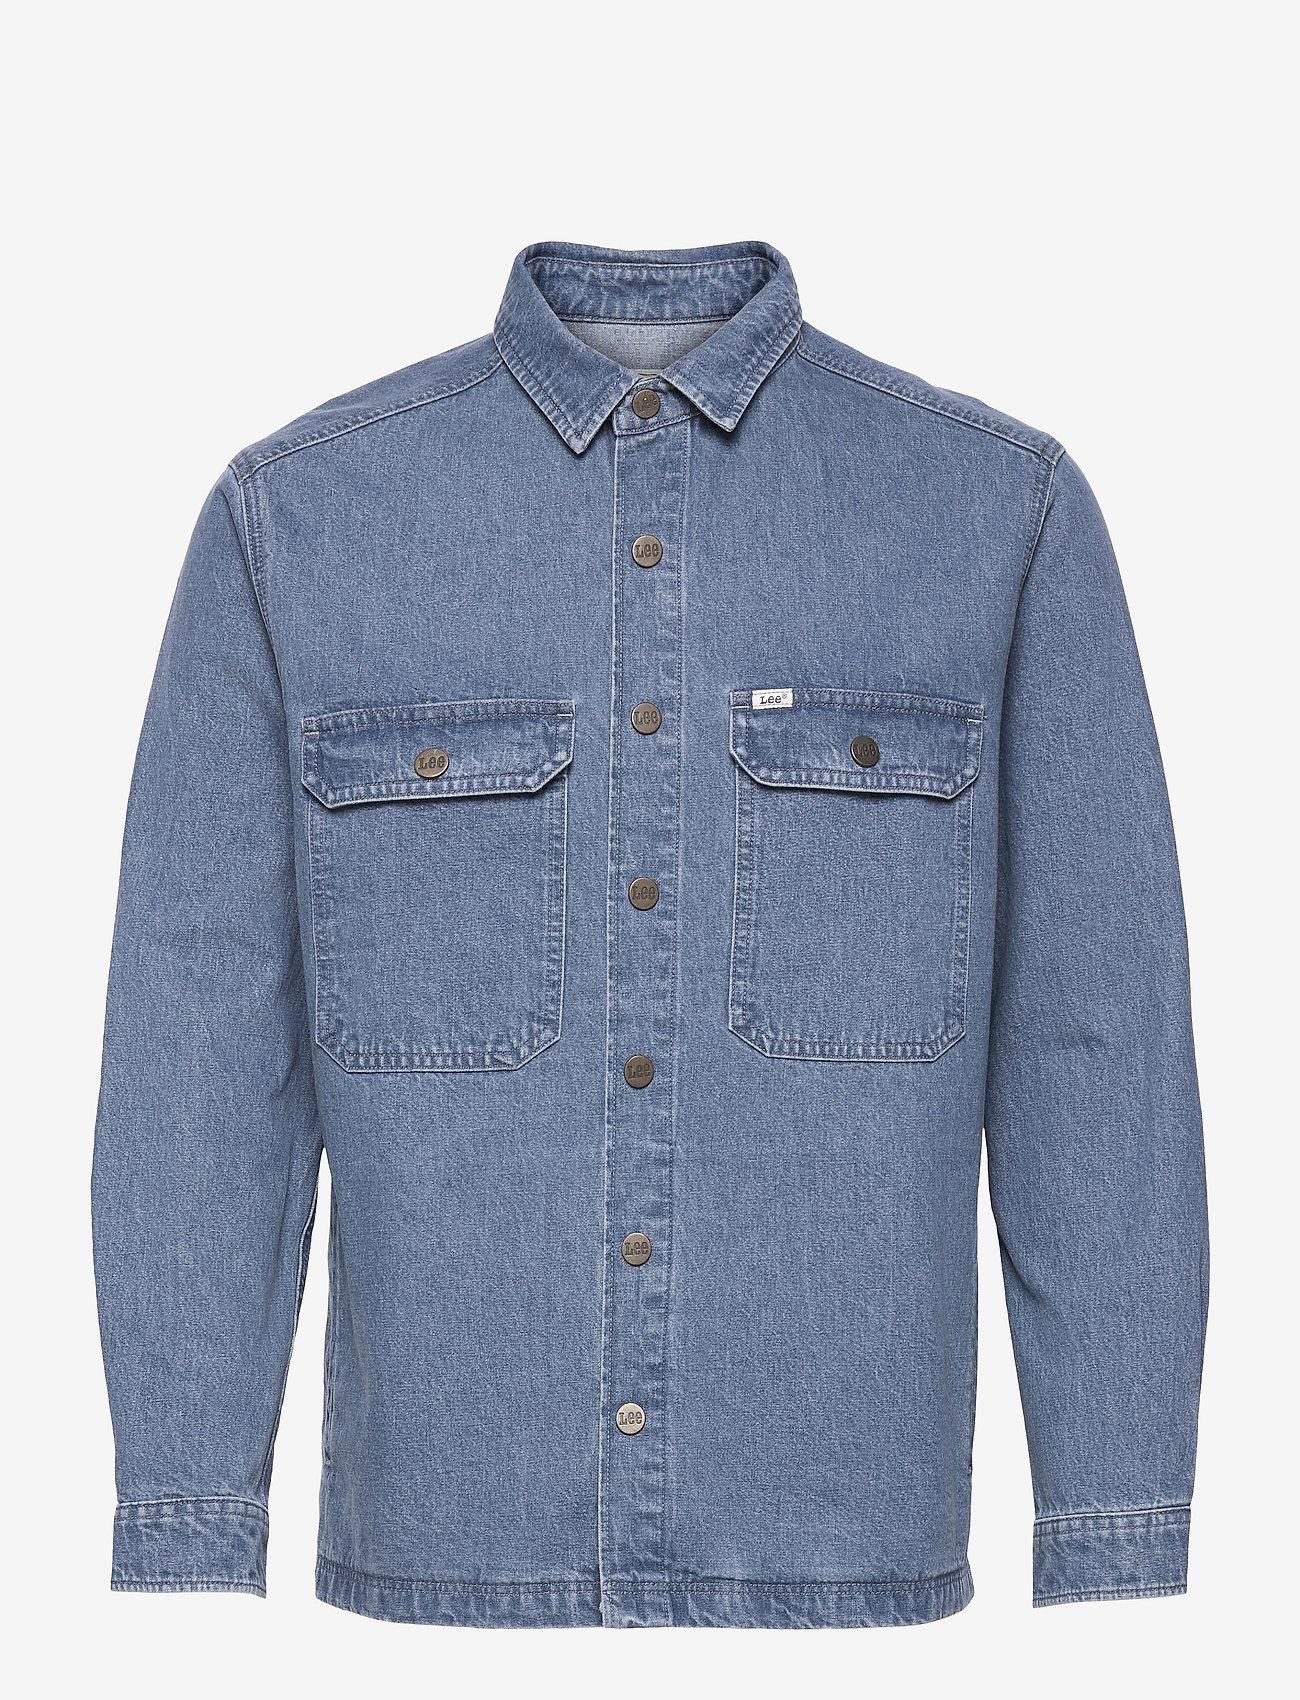 Lee Jeans - WORKWEAR OVERSHIRT - tops - grey bala - 0